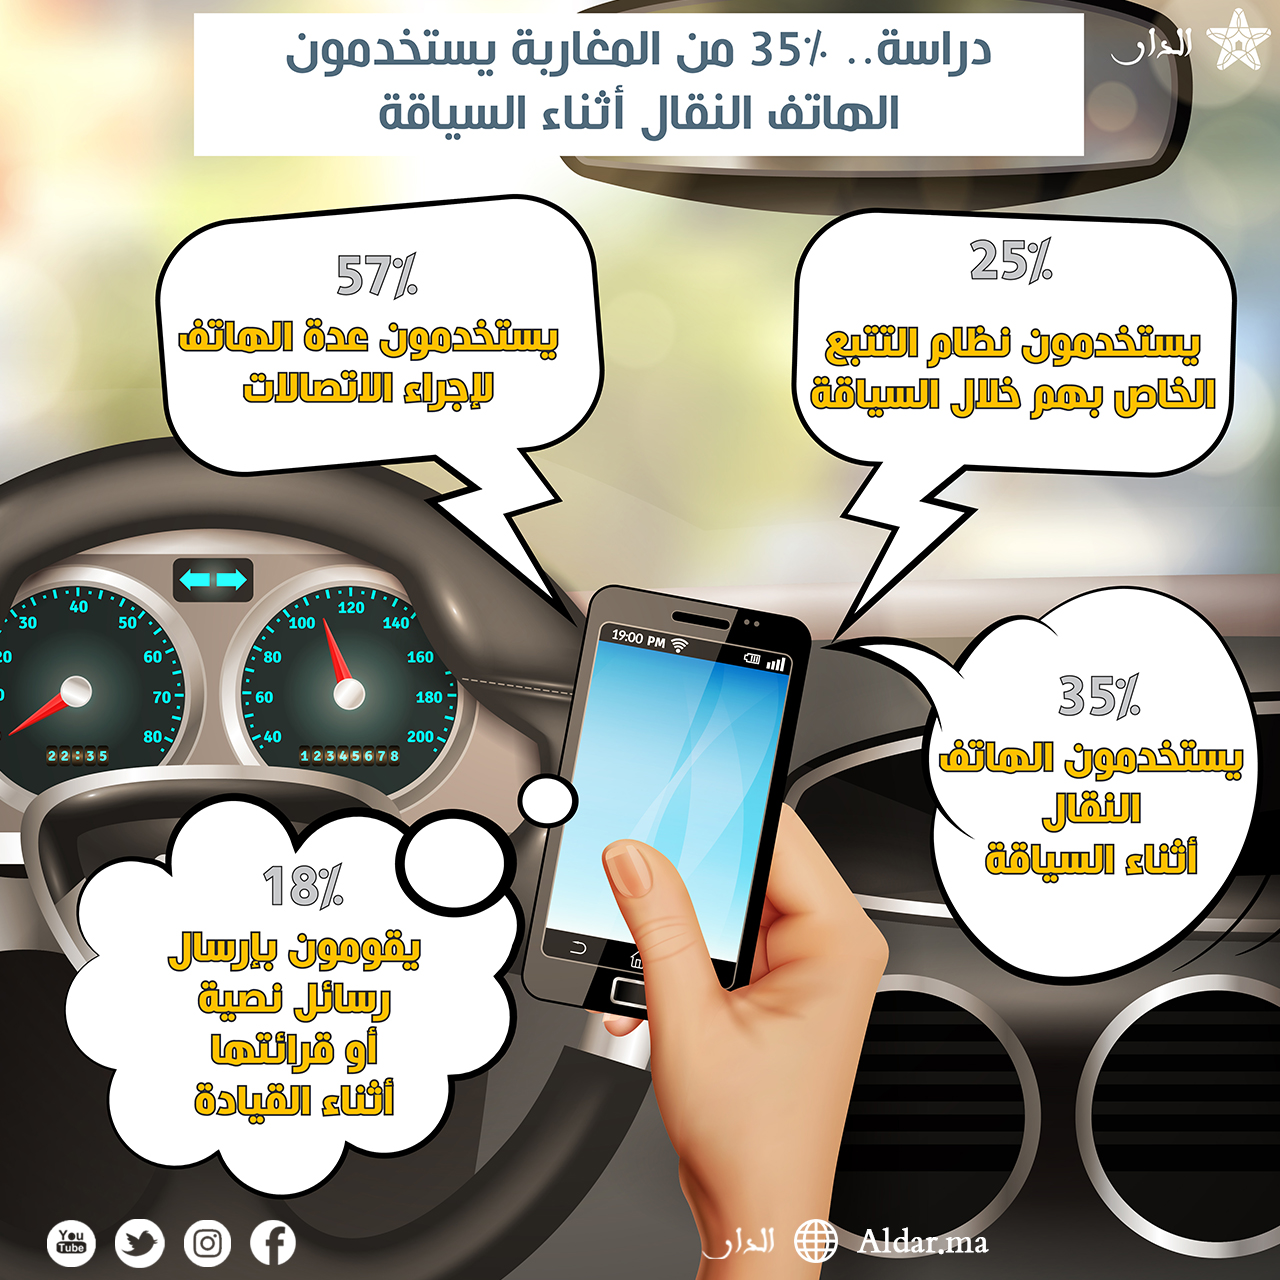 Photo of دراسة.. 35% من المغاربة يستخدمون الهاتف النقال أثناء السياقة